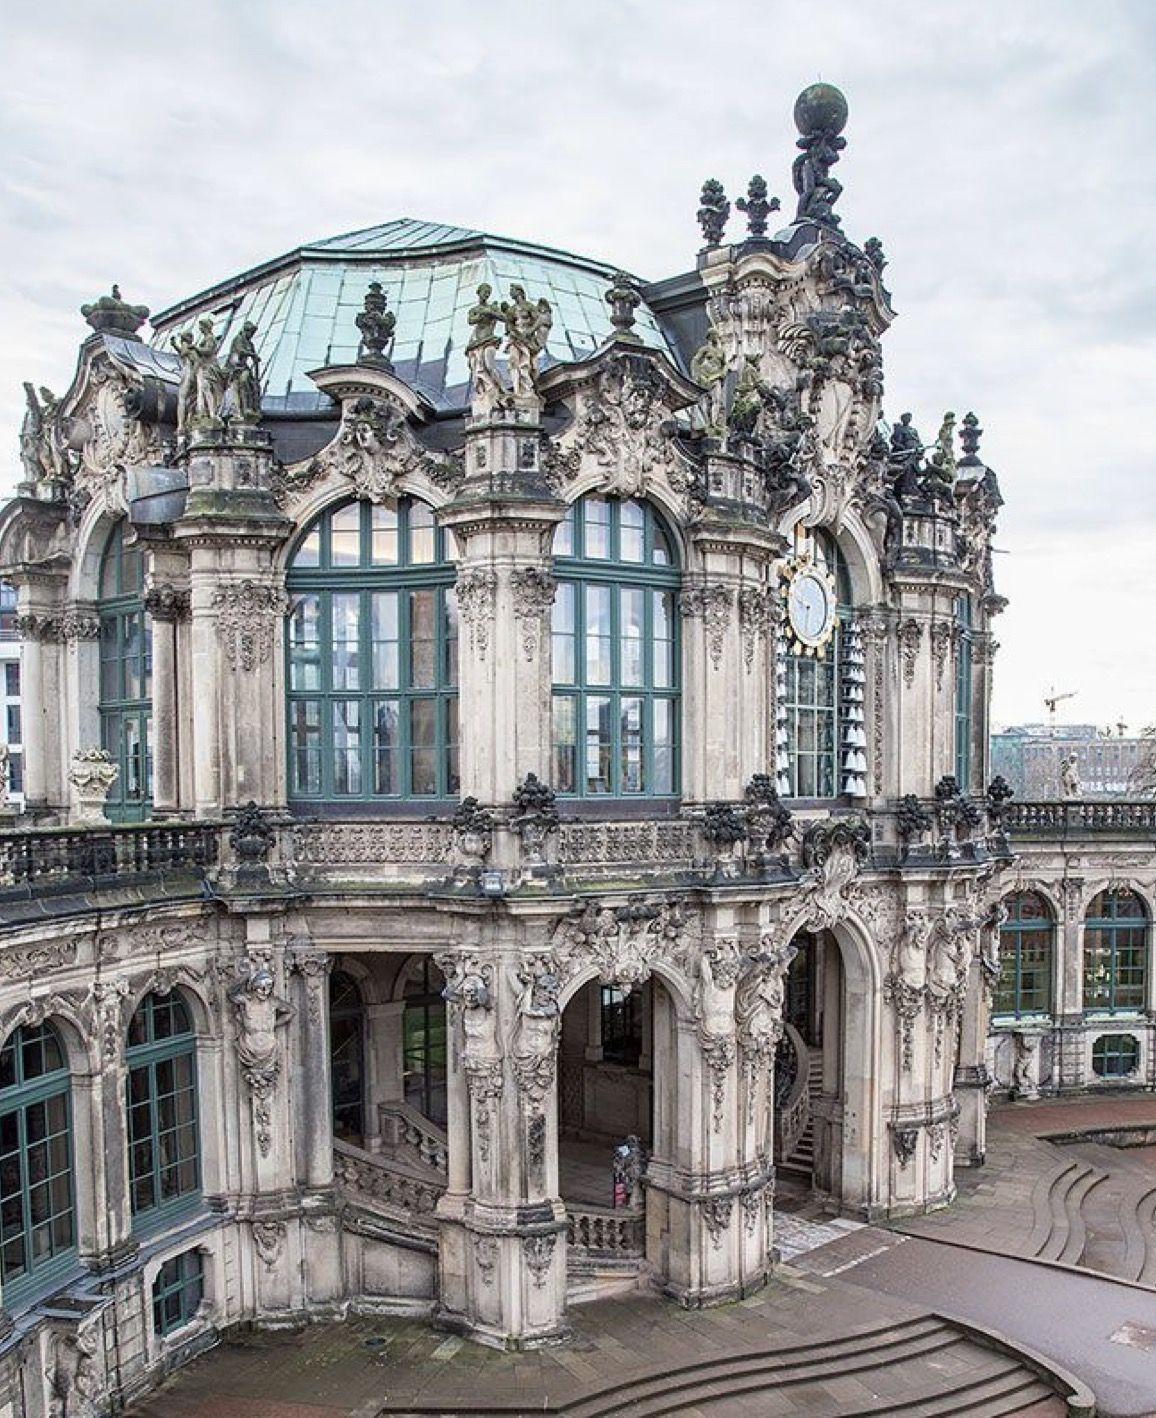 Riityeyayeѕt Wanderluster7 Barock Architektur Barocke Architektur Schone Gebaude